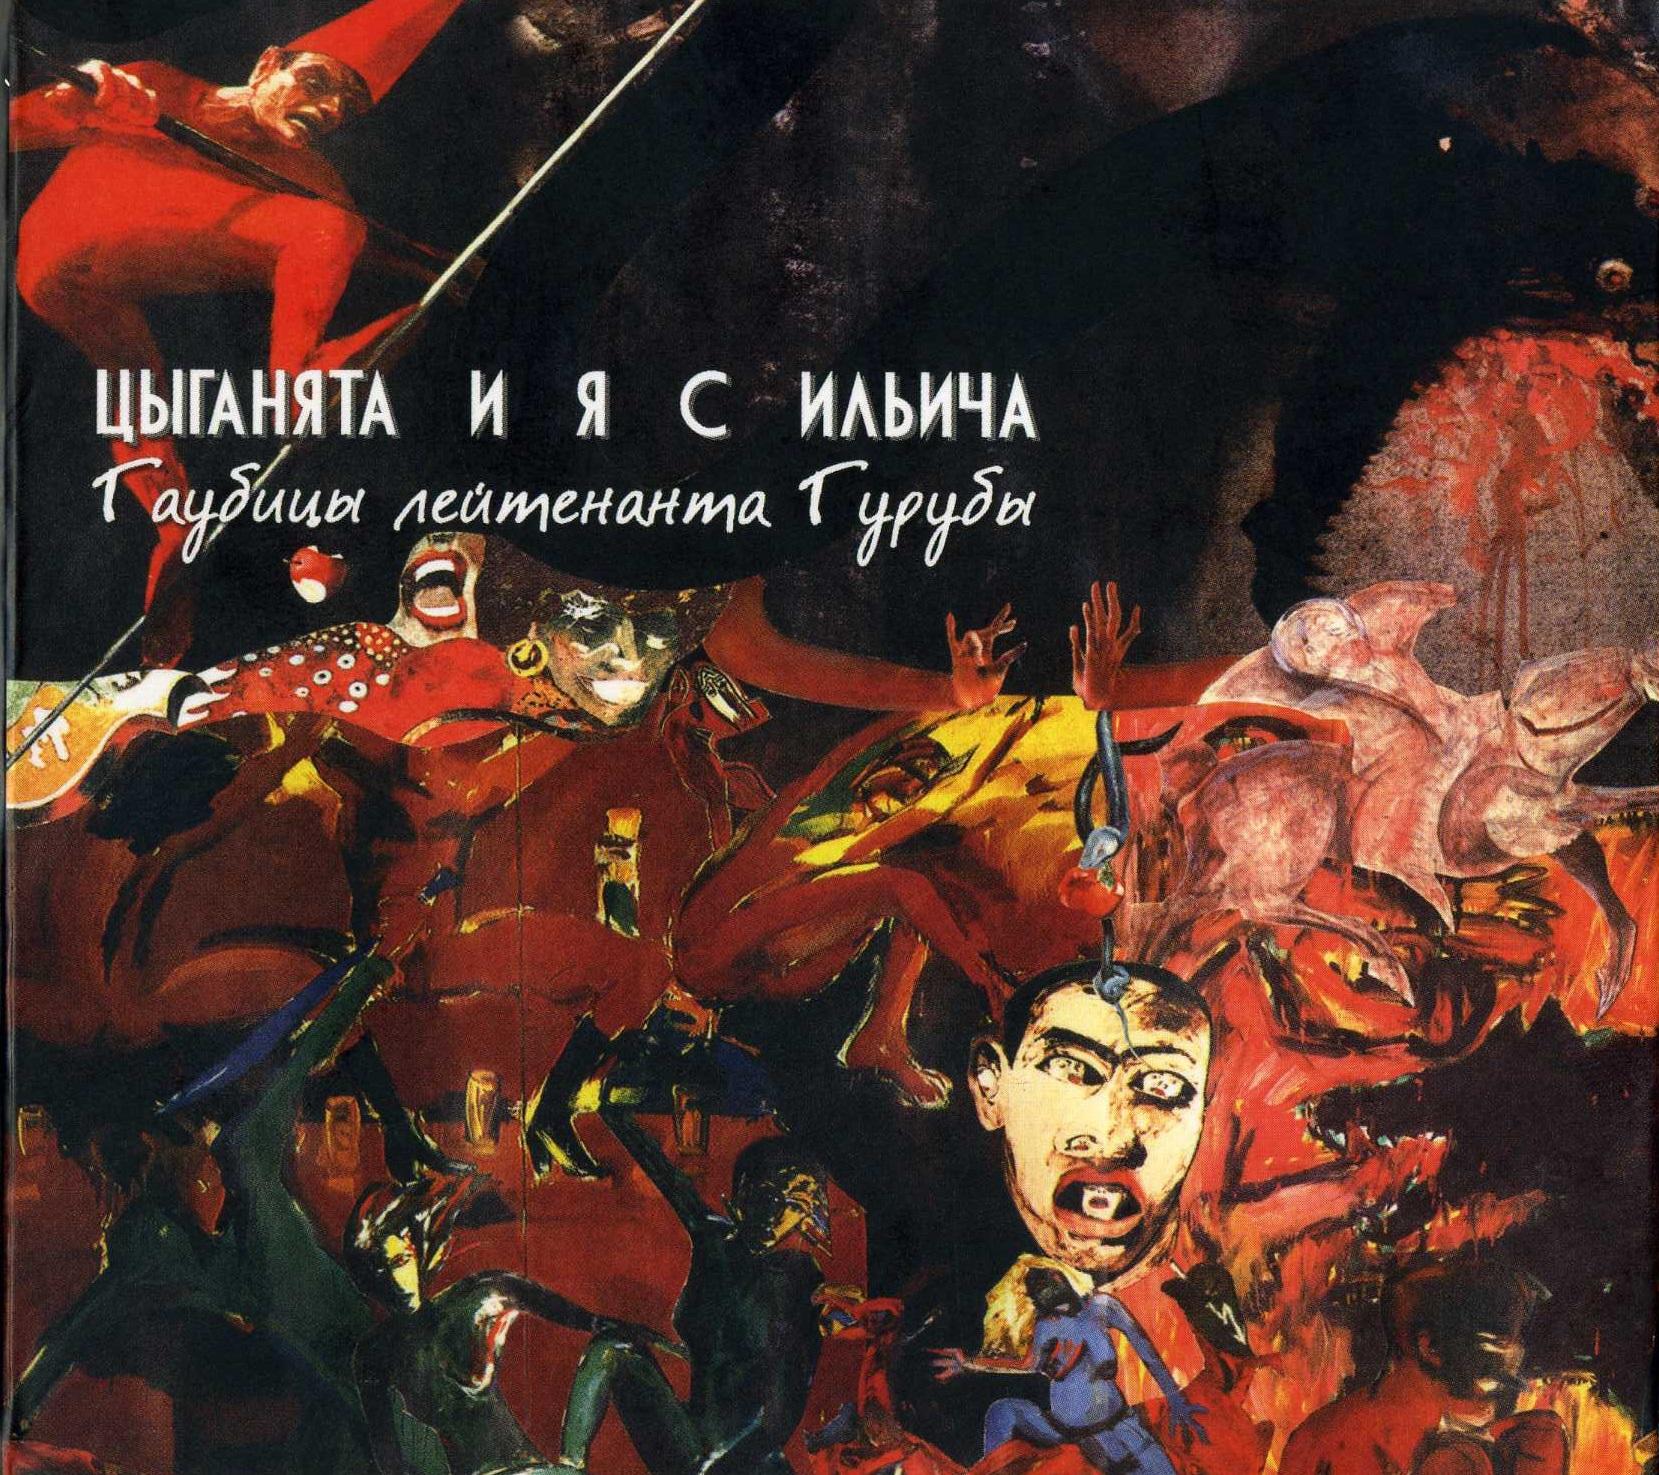 Цыганята и я с Ильича — Гаубицы лейтенанта Гурубы (1989)